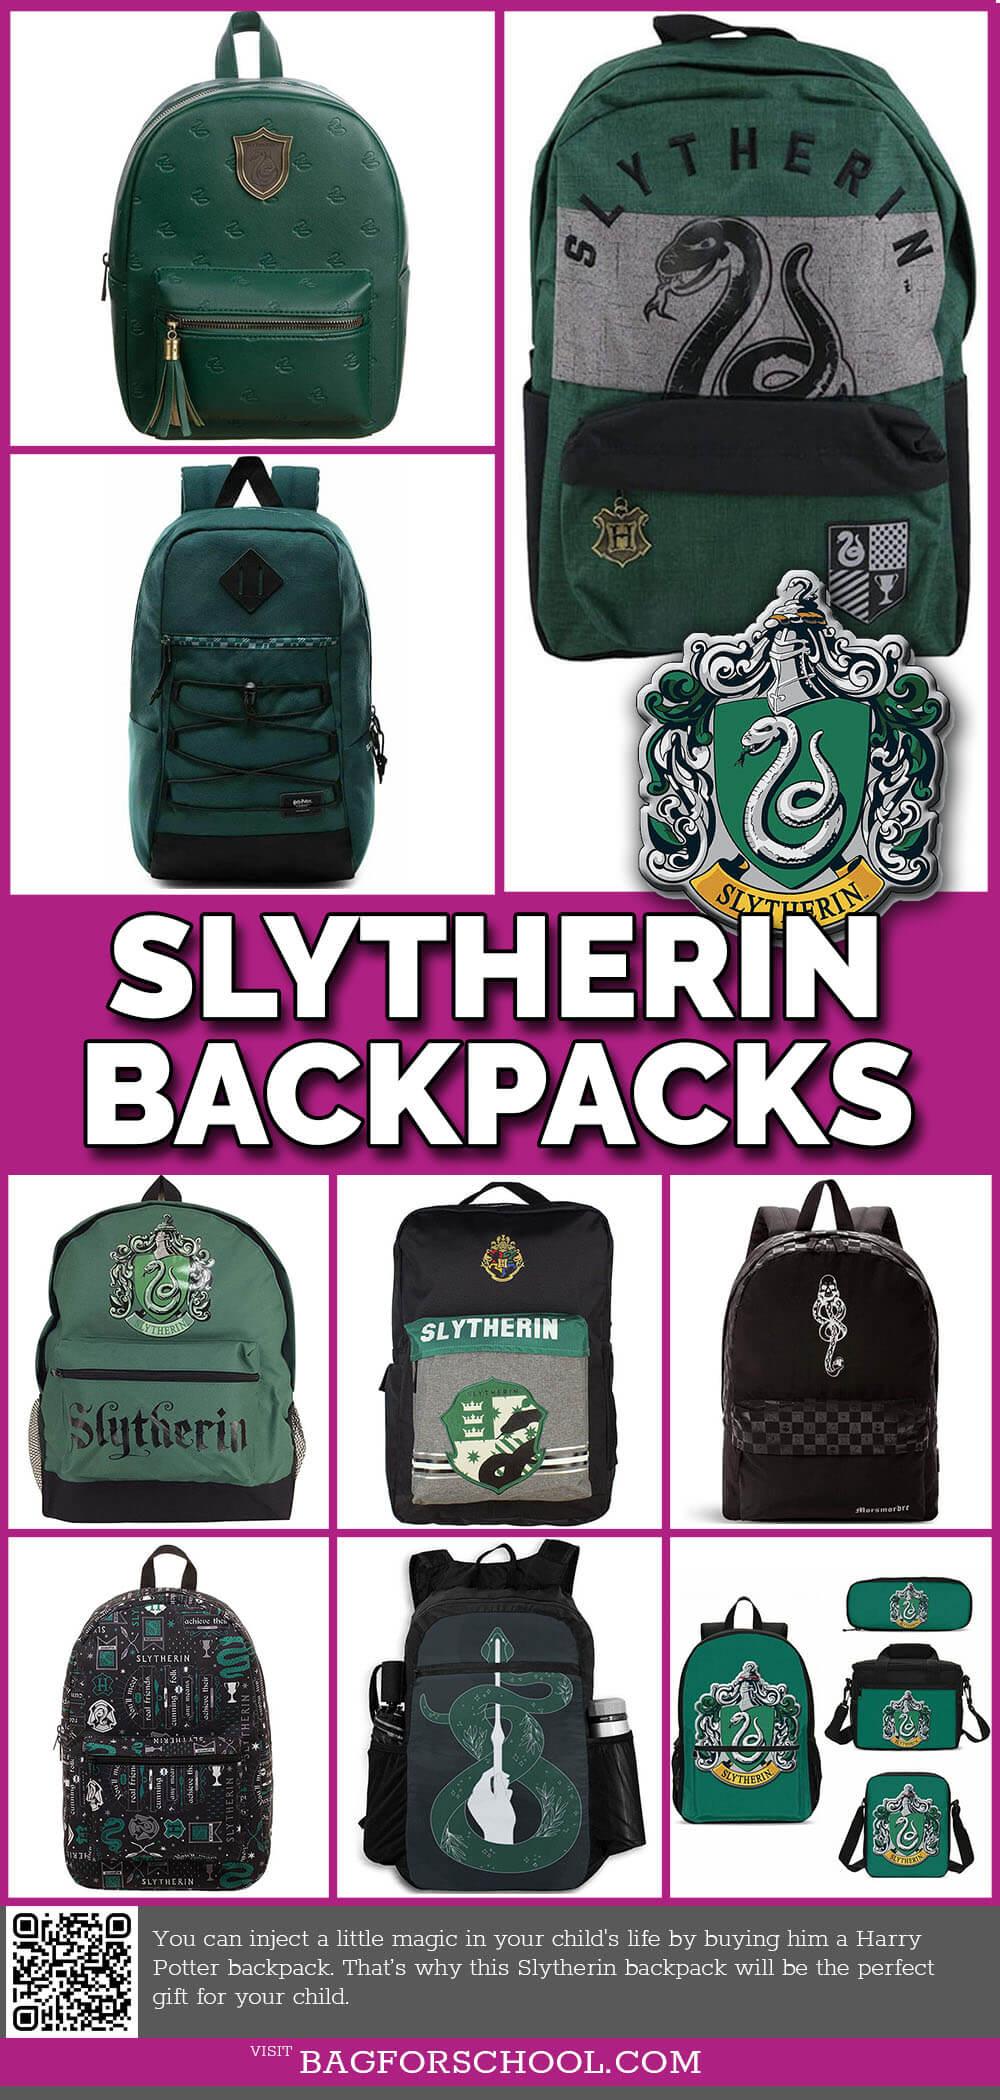 Slytherin Backpacks